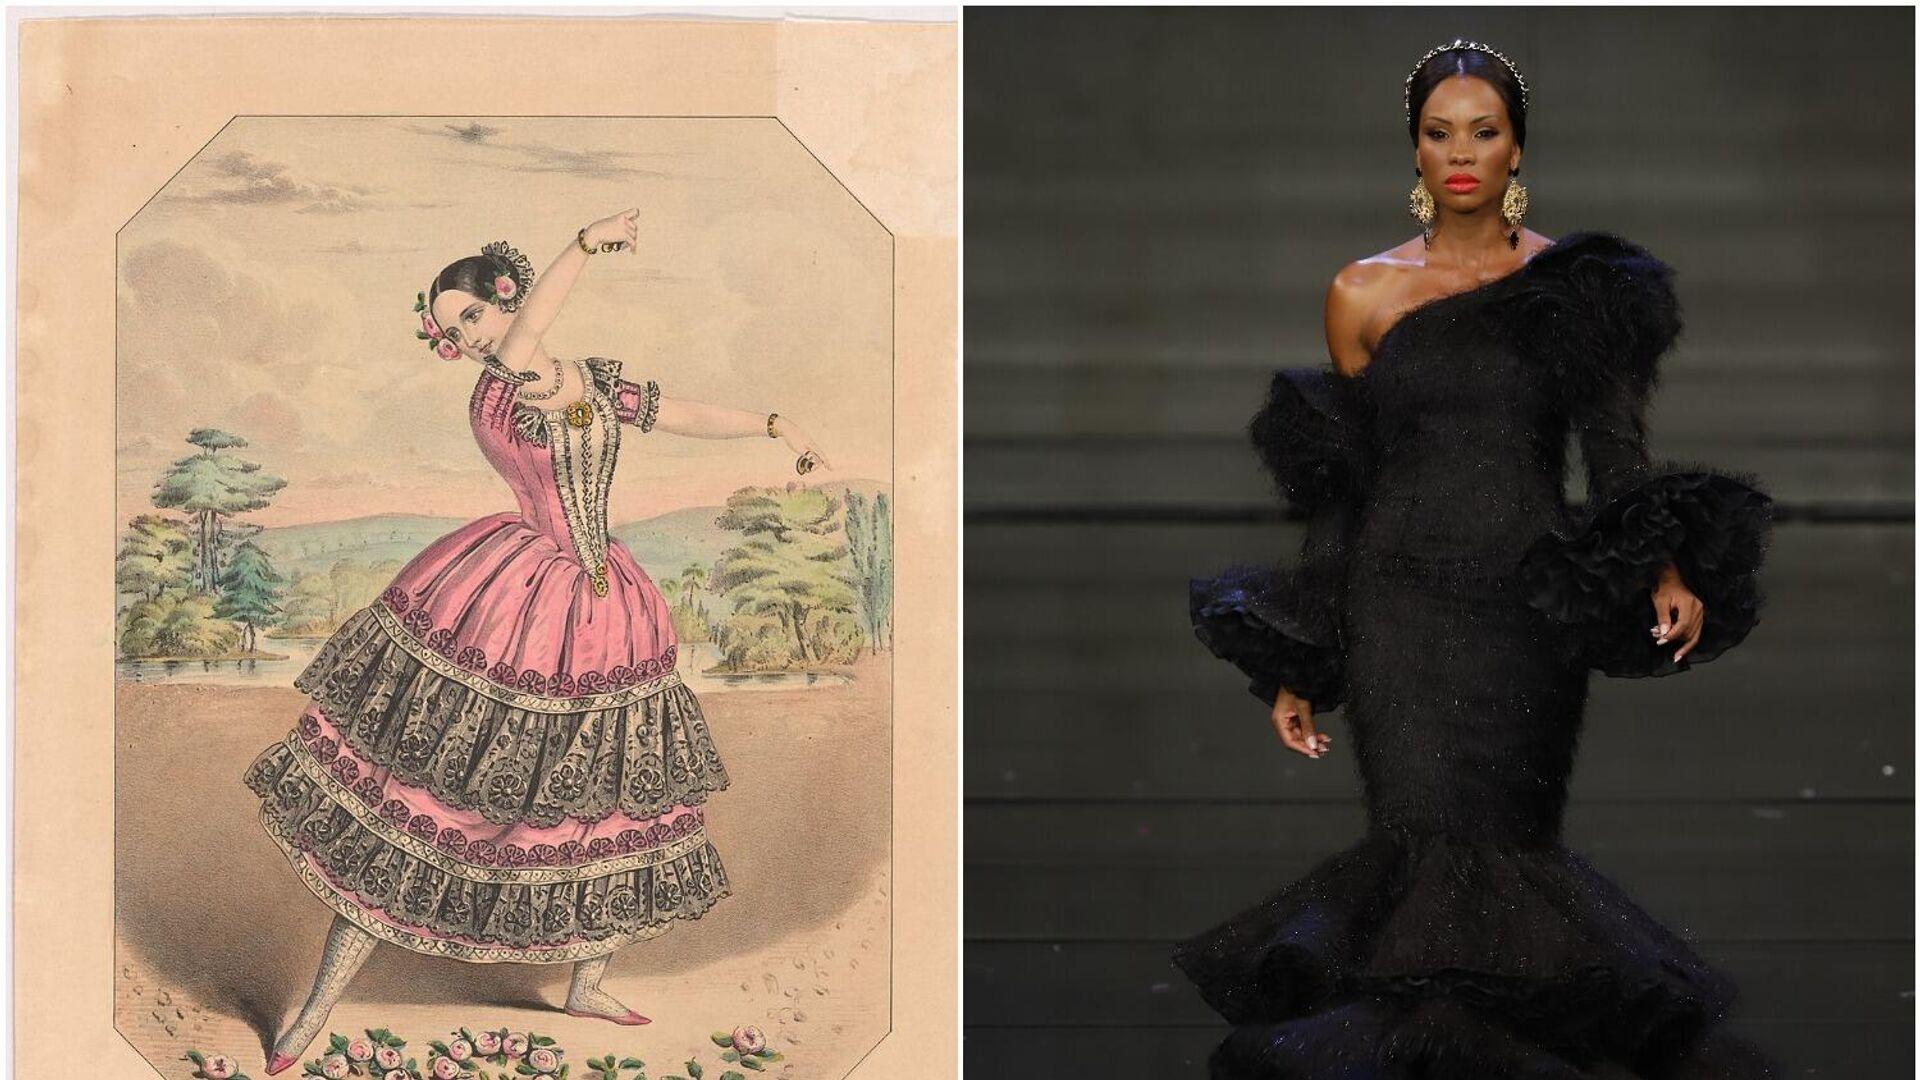 A la izquierda: Obra de Fanny Elssler de 1836 que ensalza la tradición flamenca, a la derecha: Desfile de 2020 de F de Frank - Sputnik Mundo, 1920, 01.04.2021